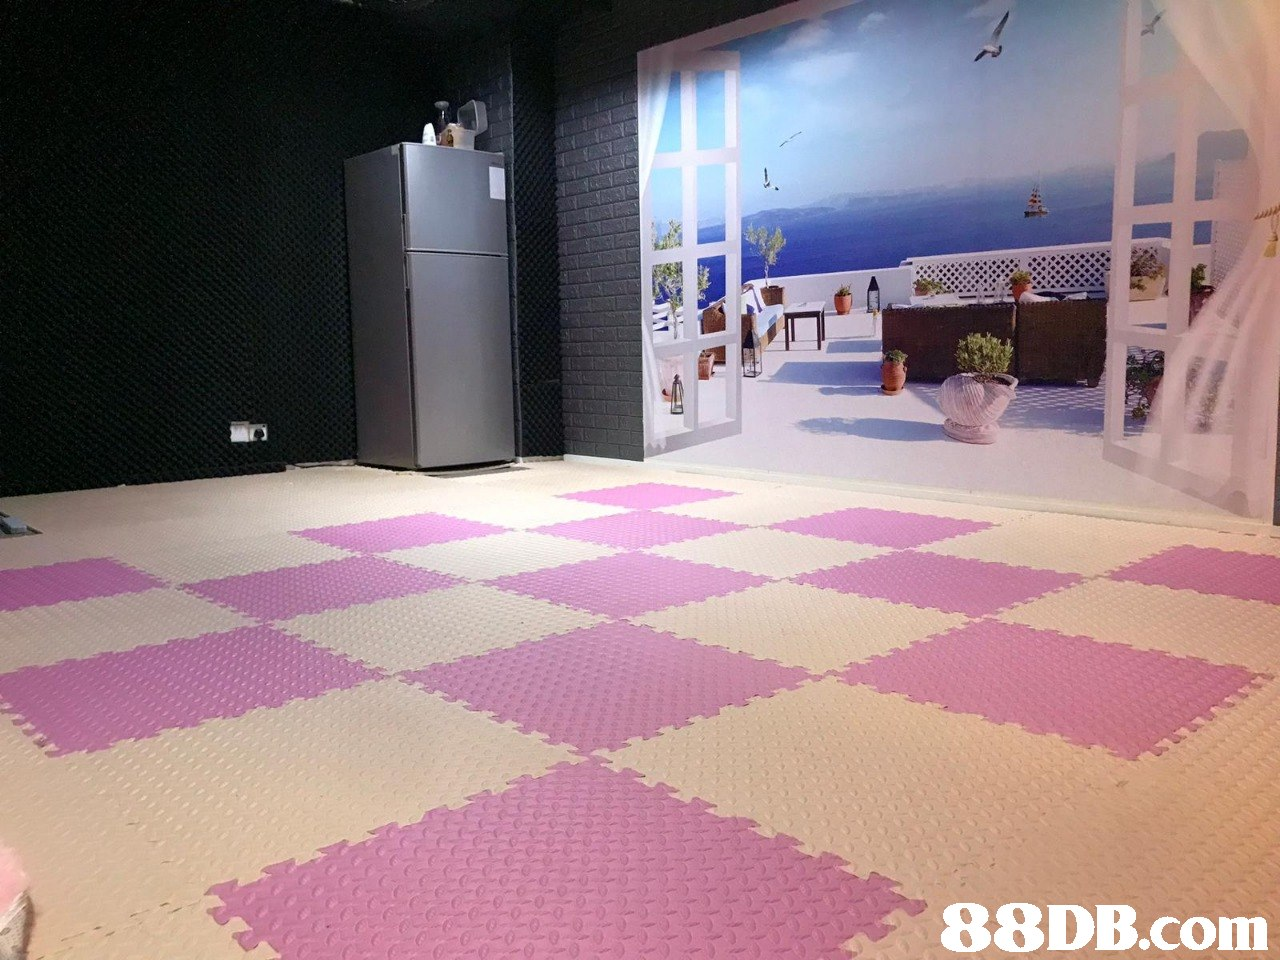 floor,property,flooring,room,purple